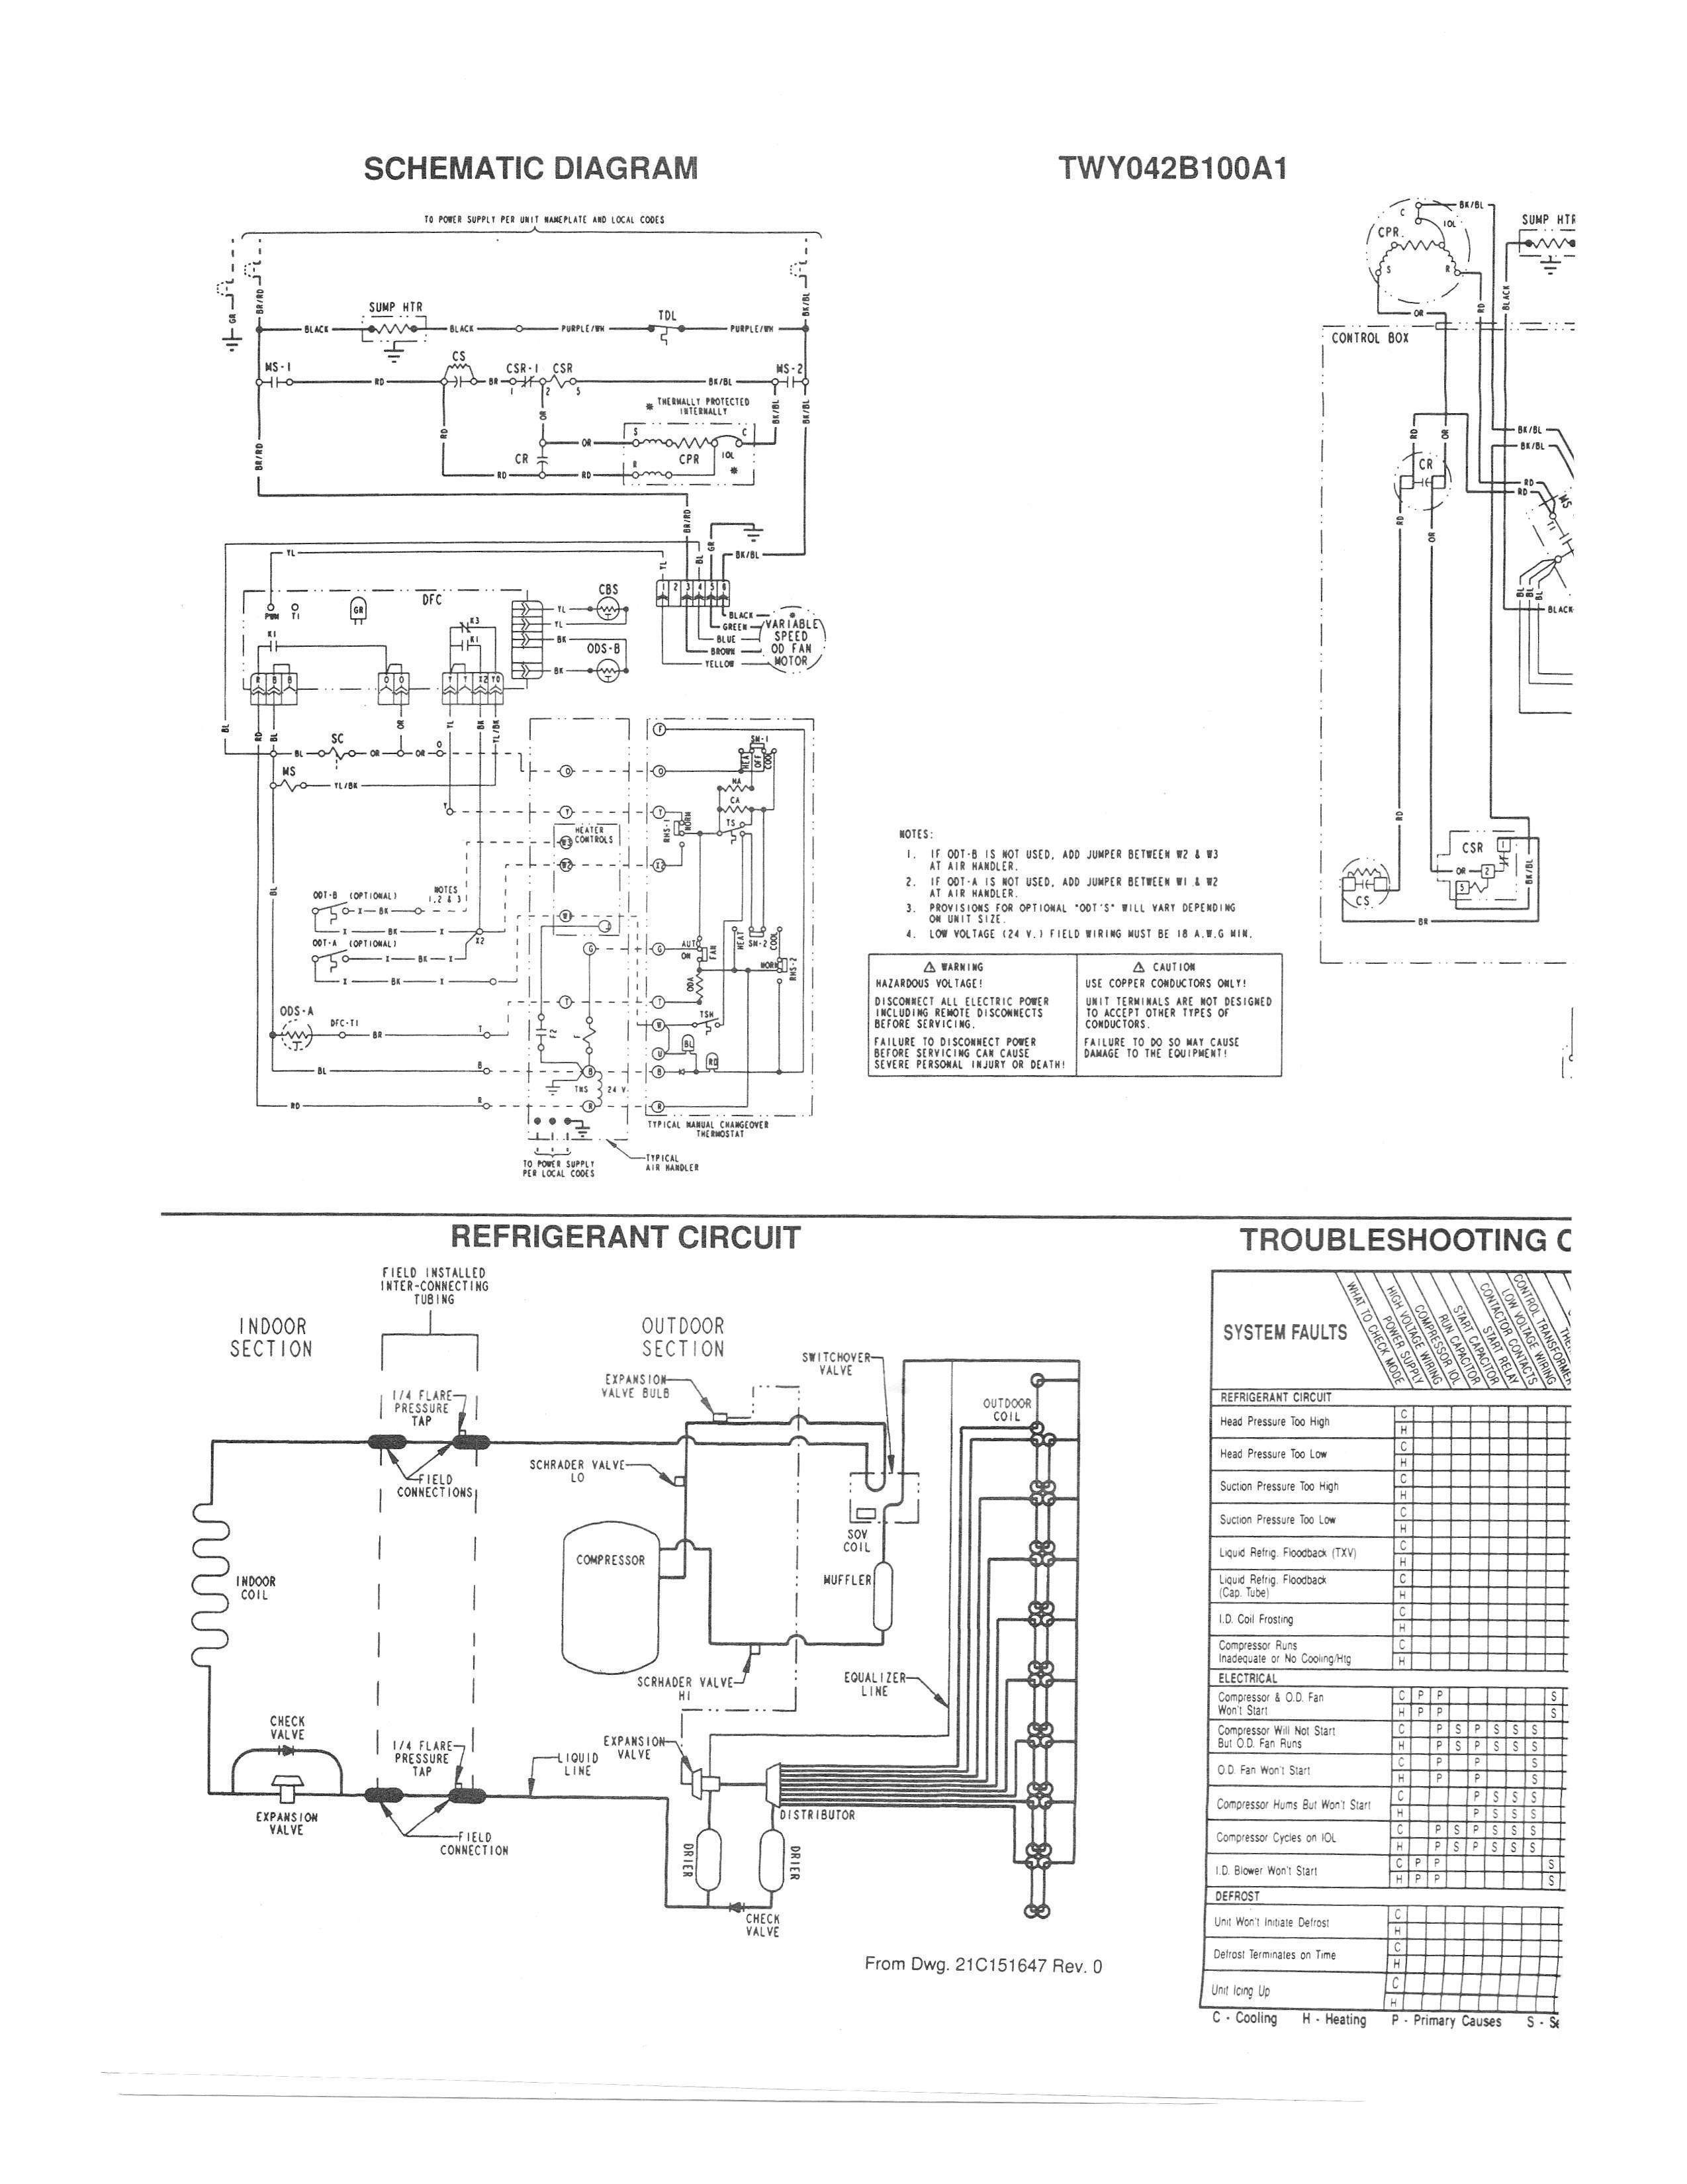 Wiring Diagram for Trane Air Conditioner Trane Hvac Wiring Diagrams Schematics with Air Conditioner Diagram Of Wiring Diagram for Trane Air Conditioner